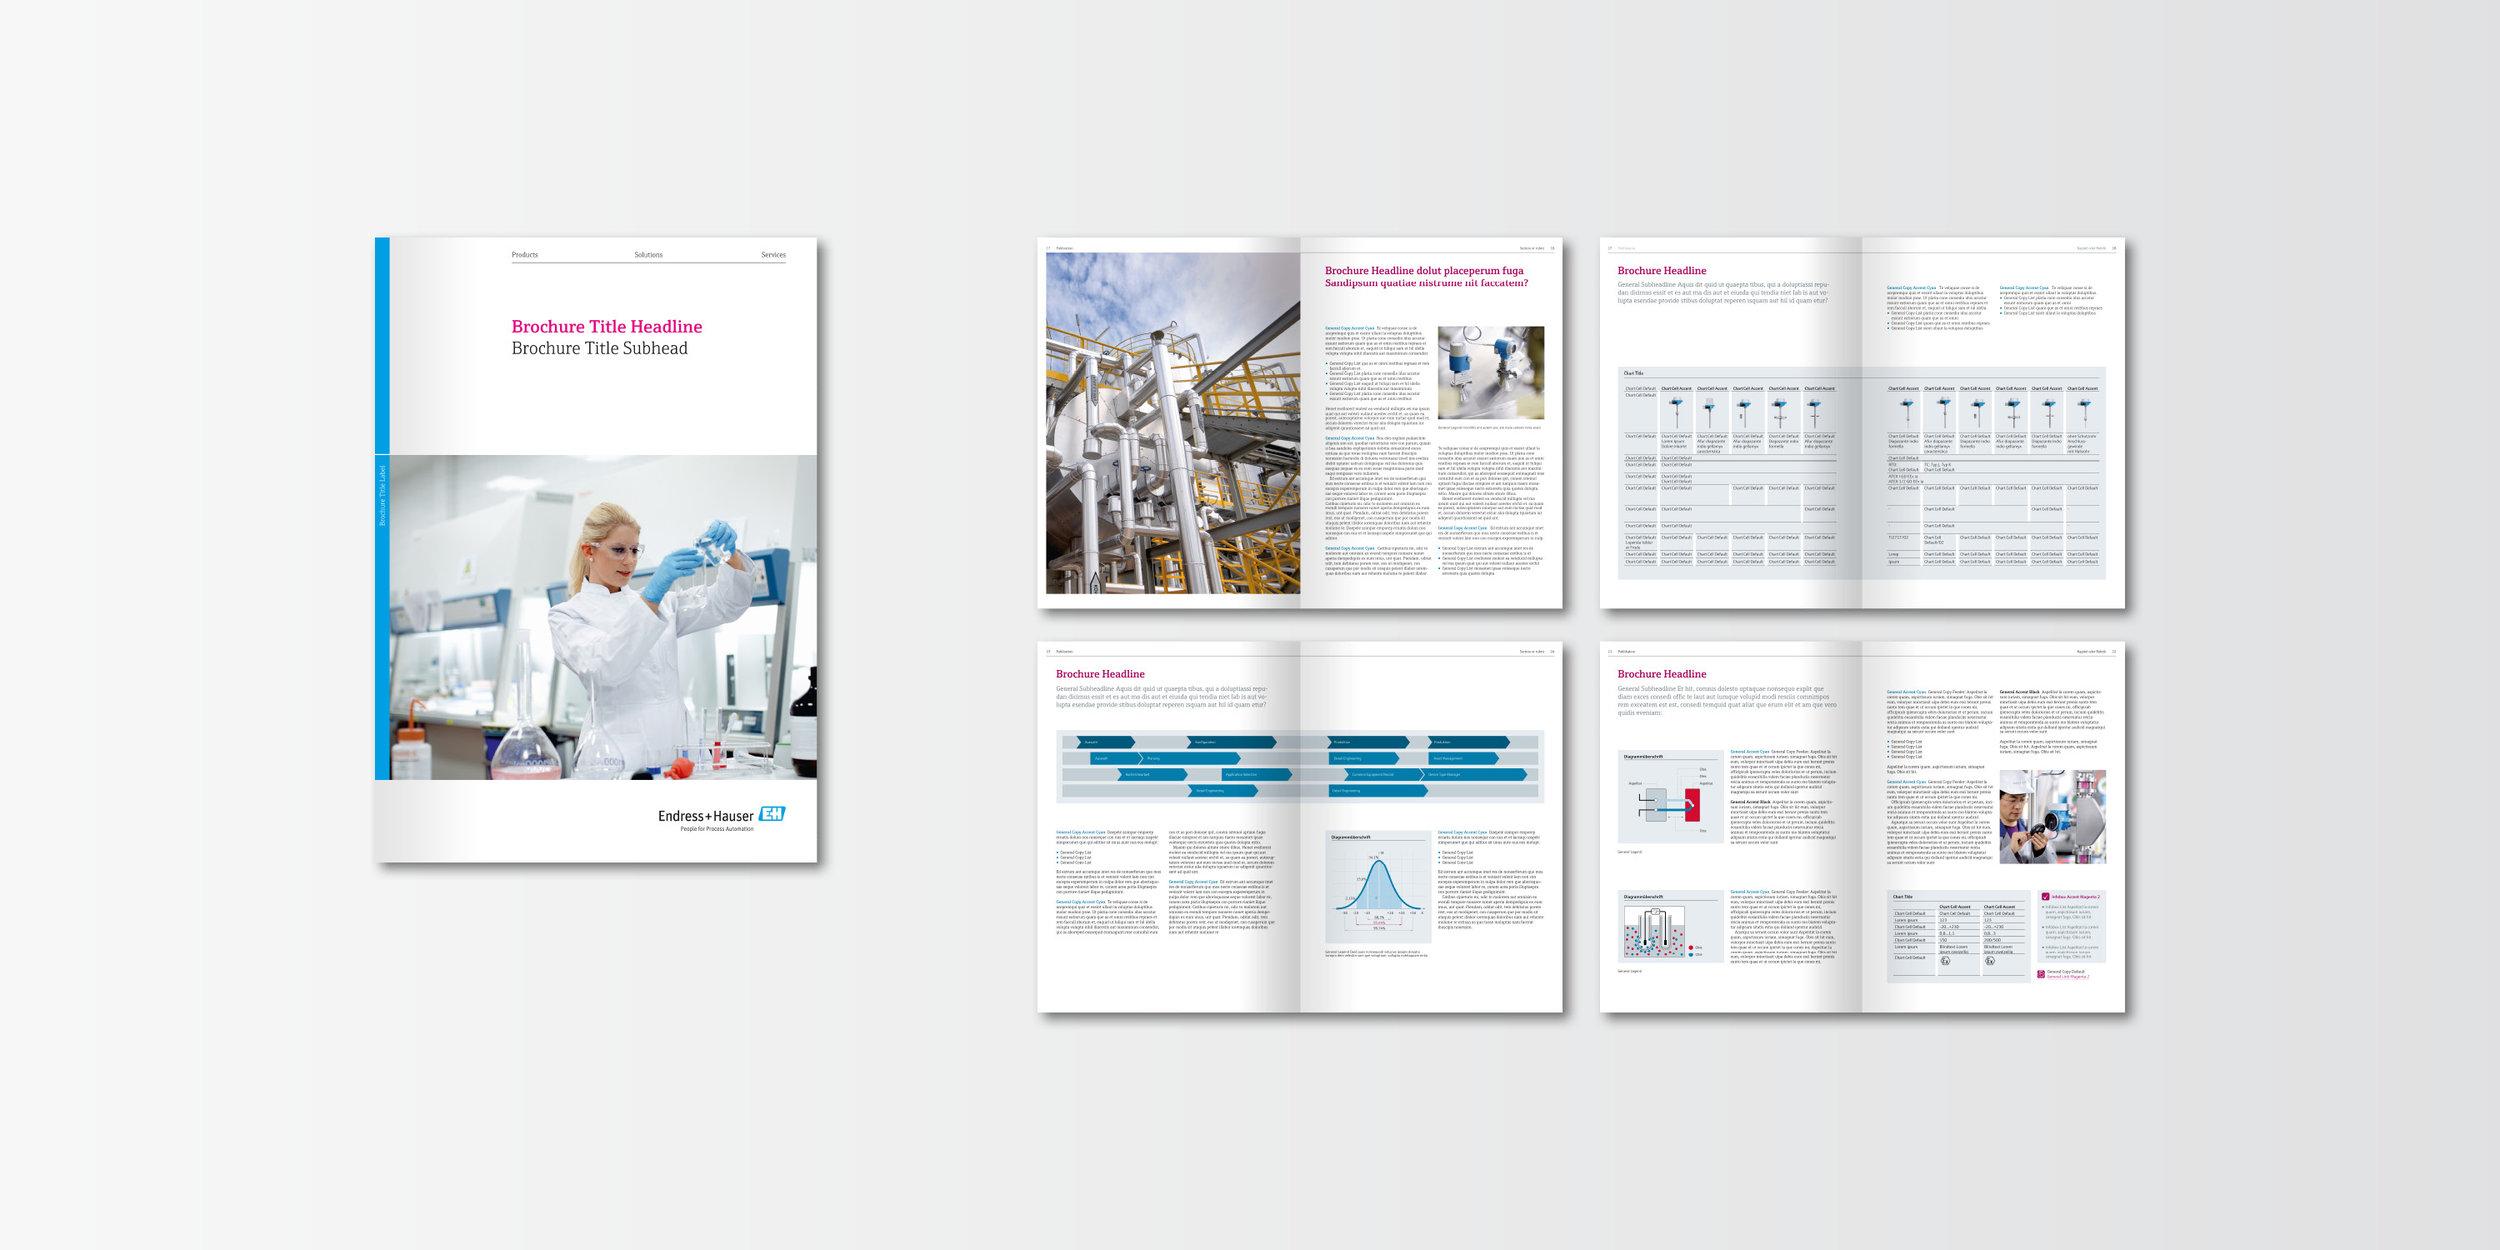 Endress+Hauser Corporate Design 05.jpg